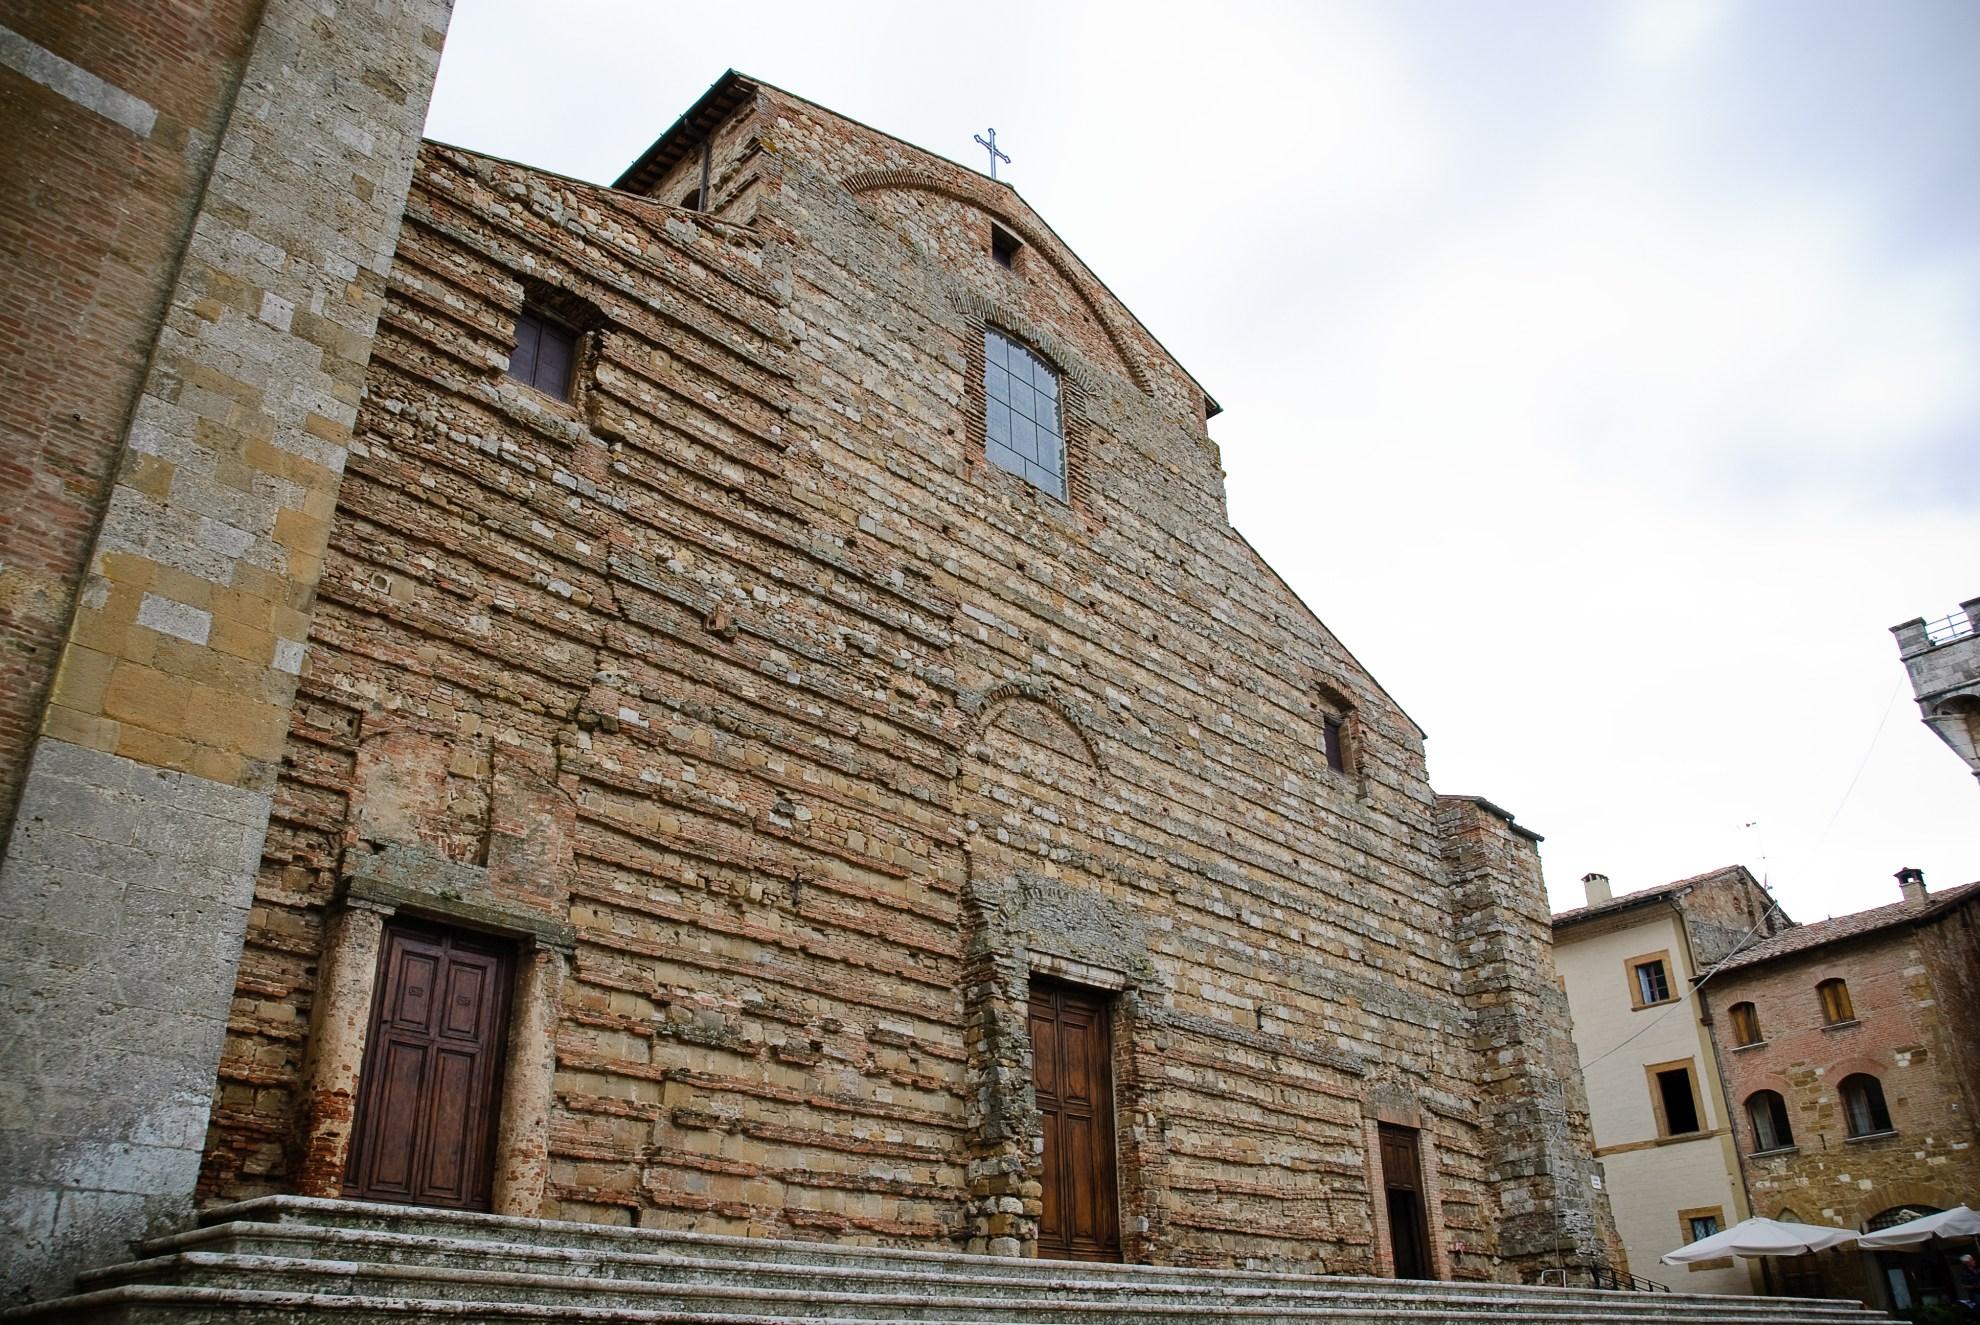 Katedra w Montepulciano